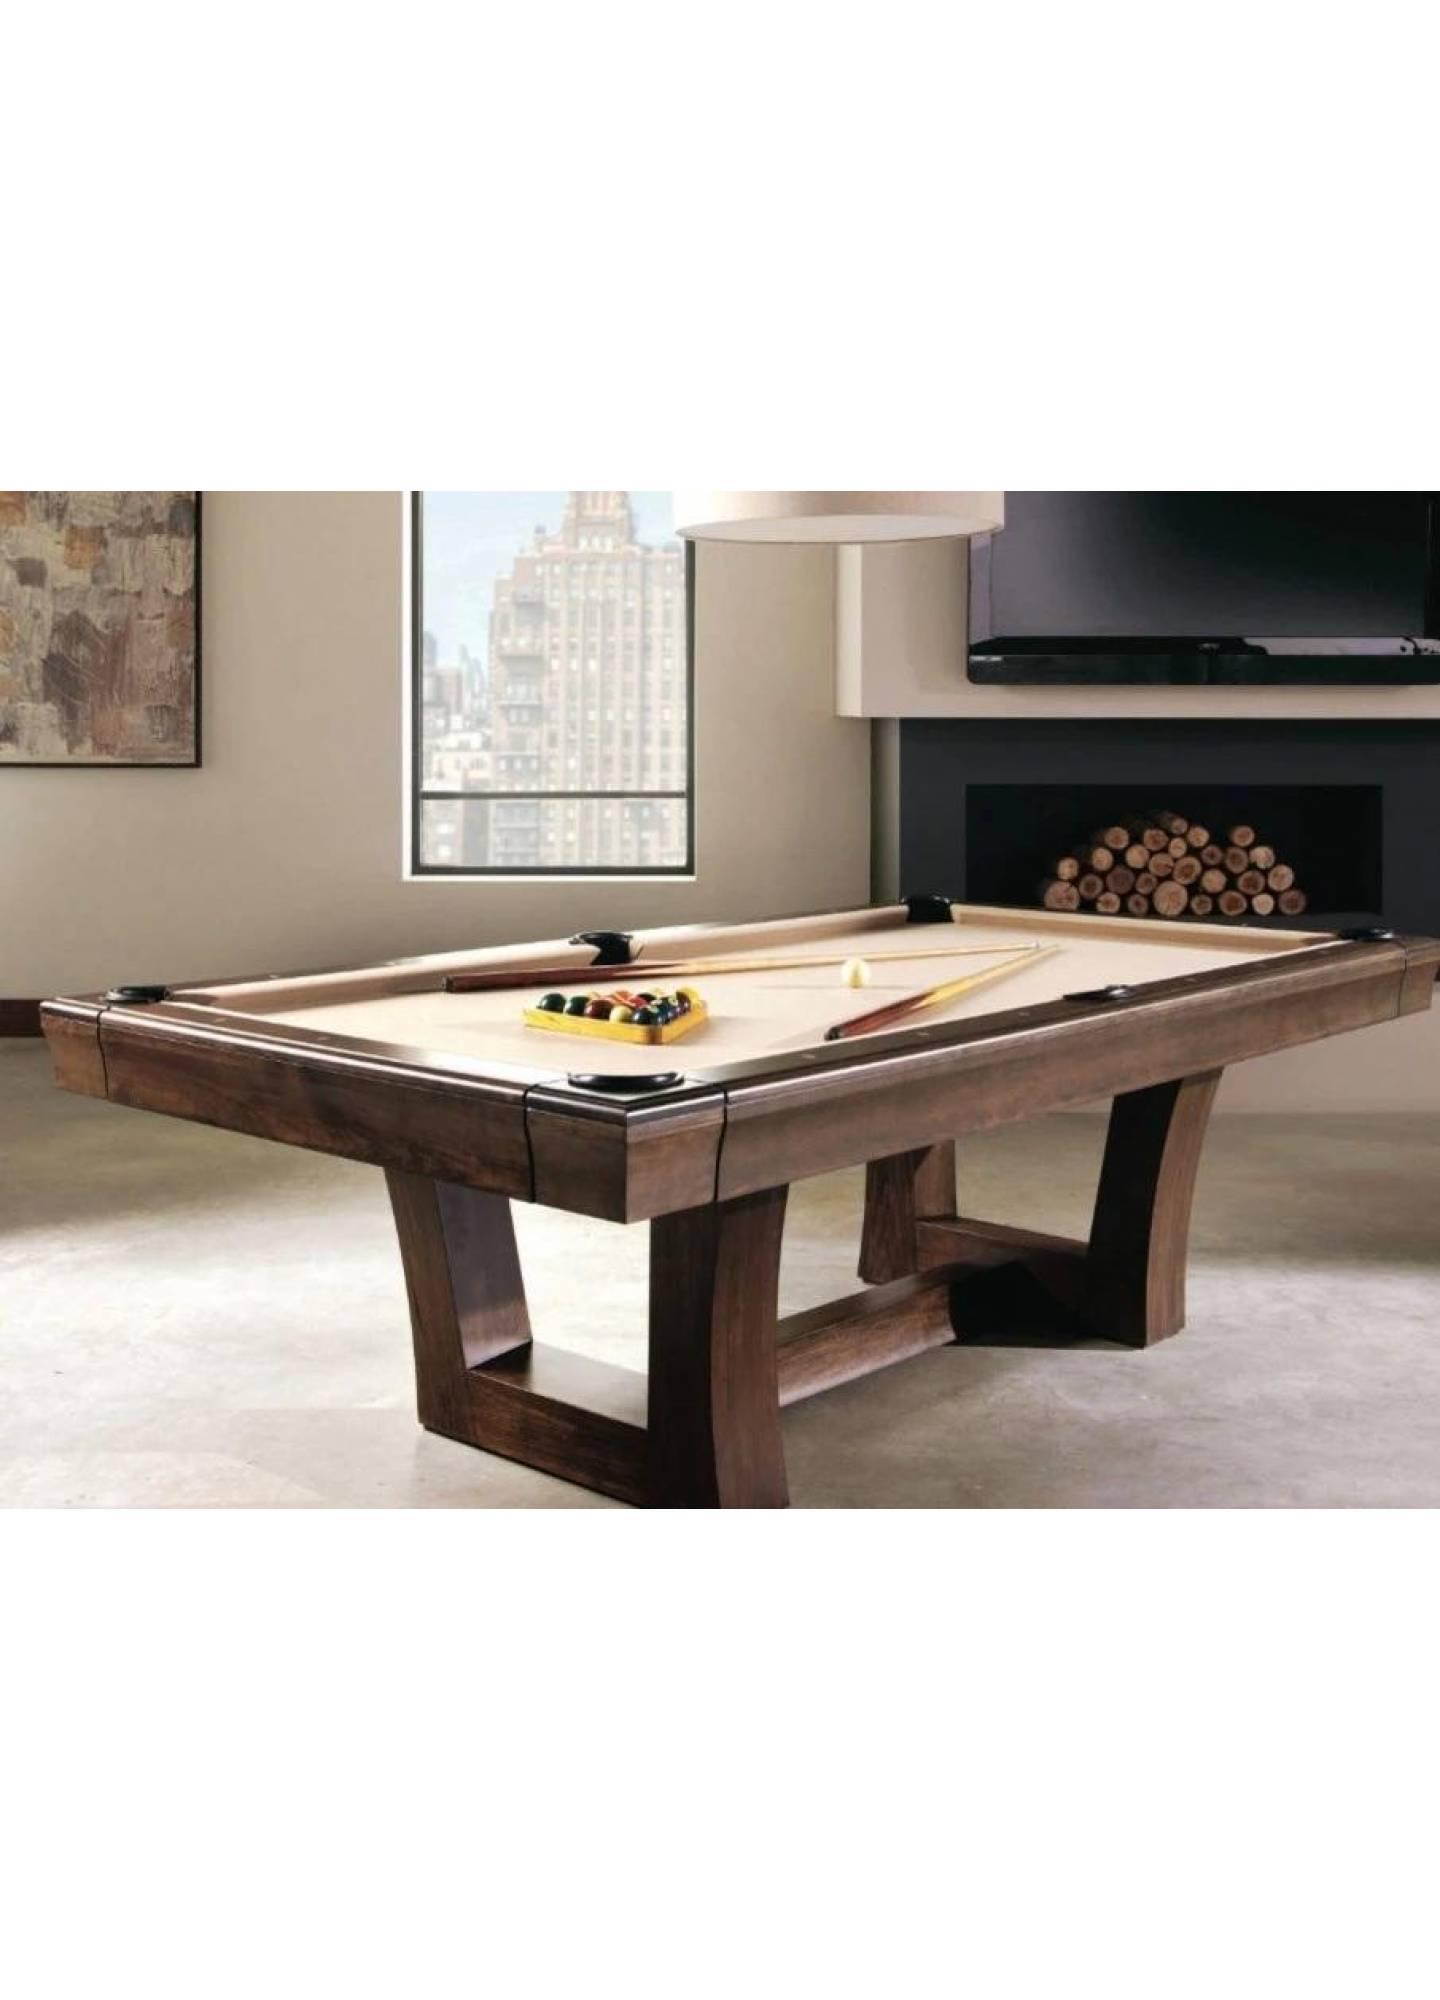 WESCOTT POOL TABLE (CLASSIC LINE)